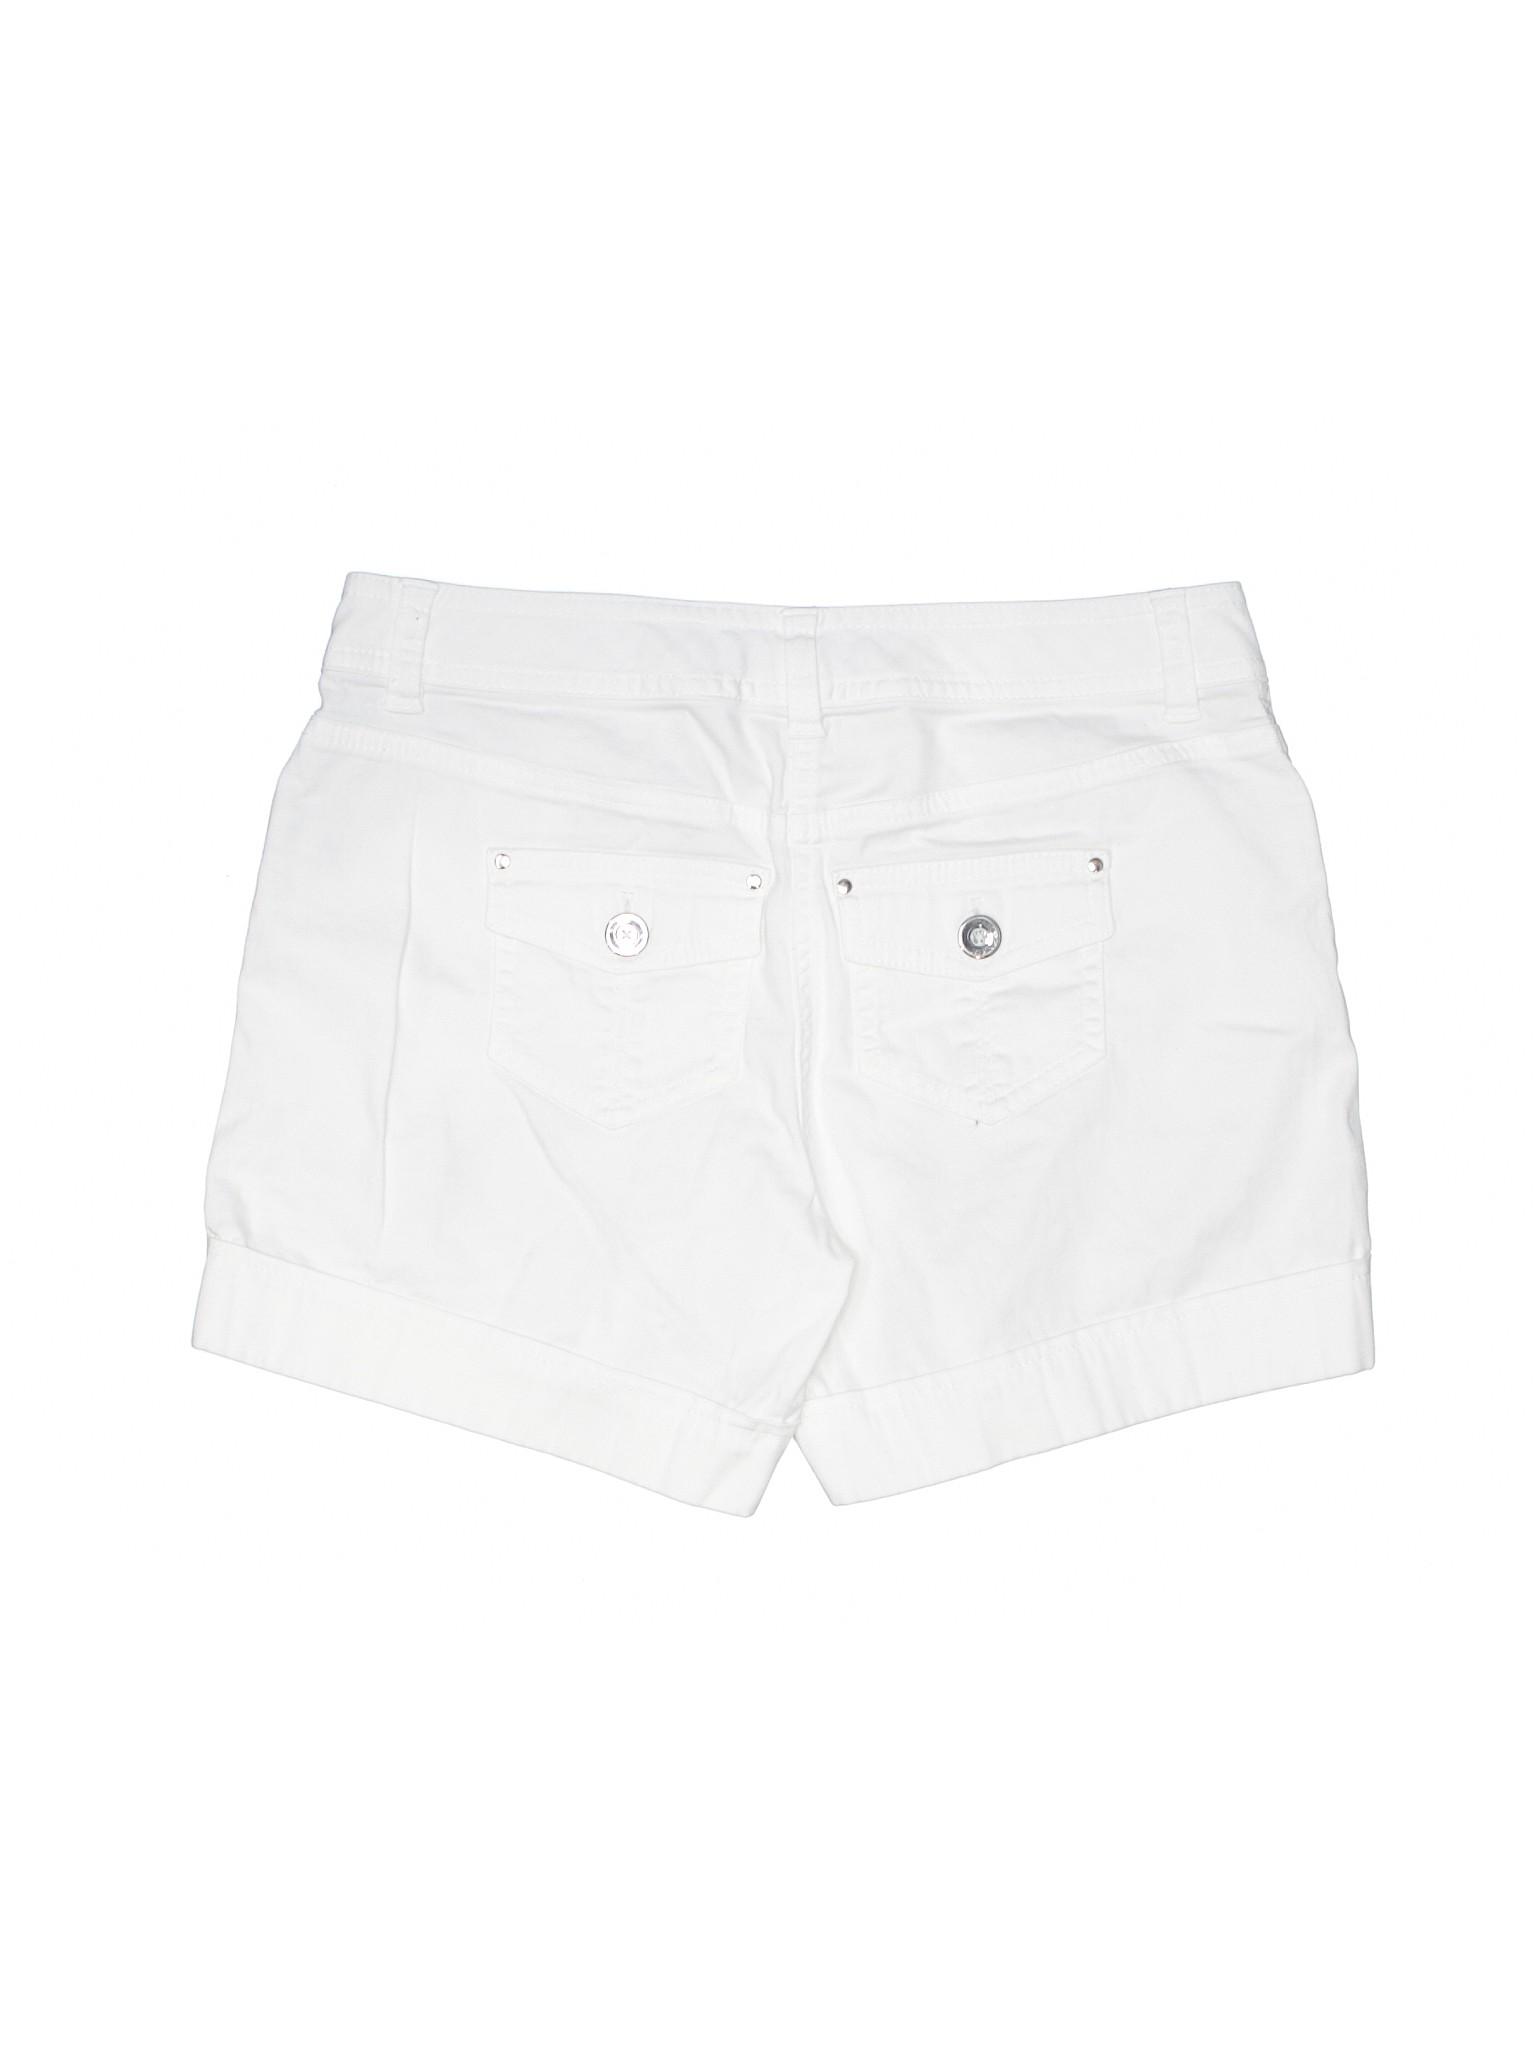 Boutique White House Shorts Black Market qAwgR7q